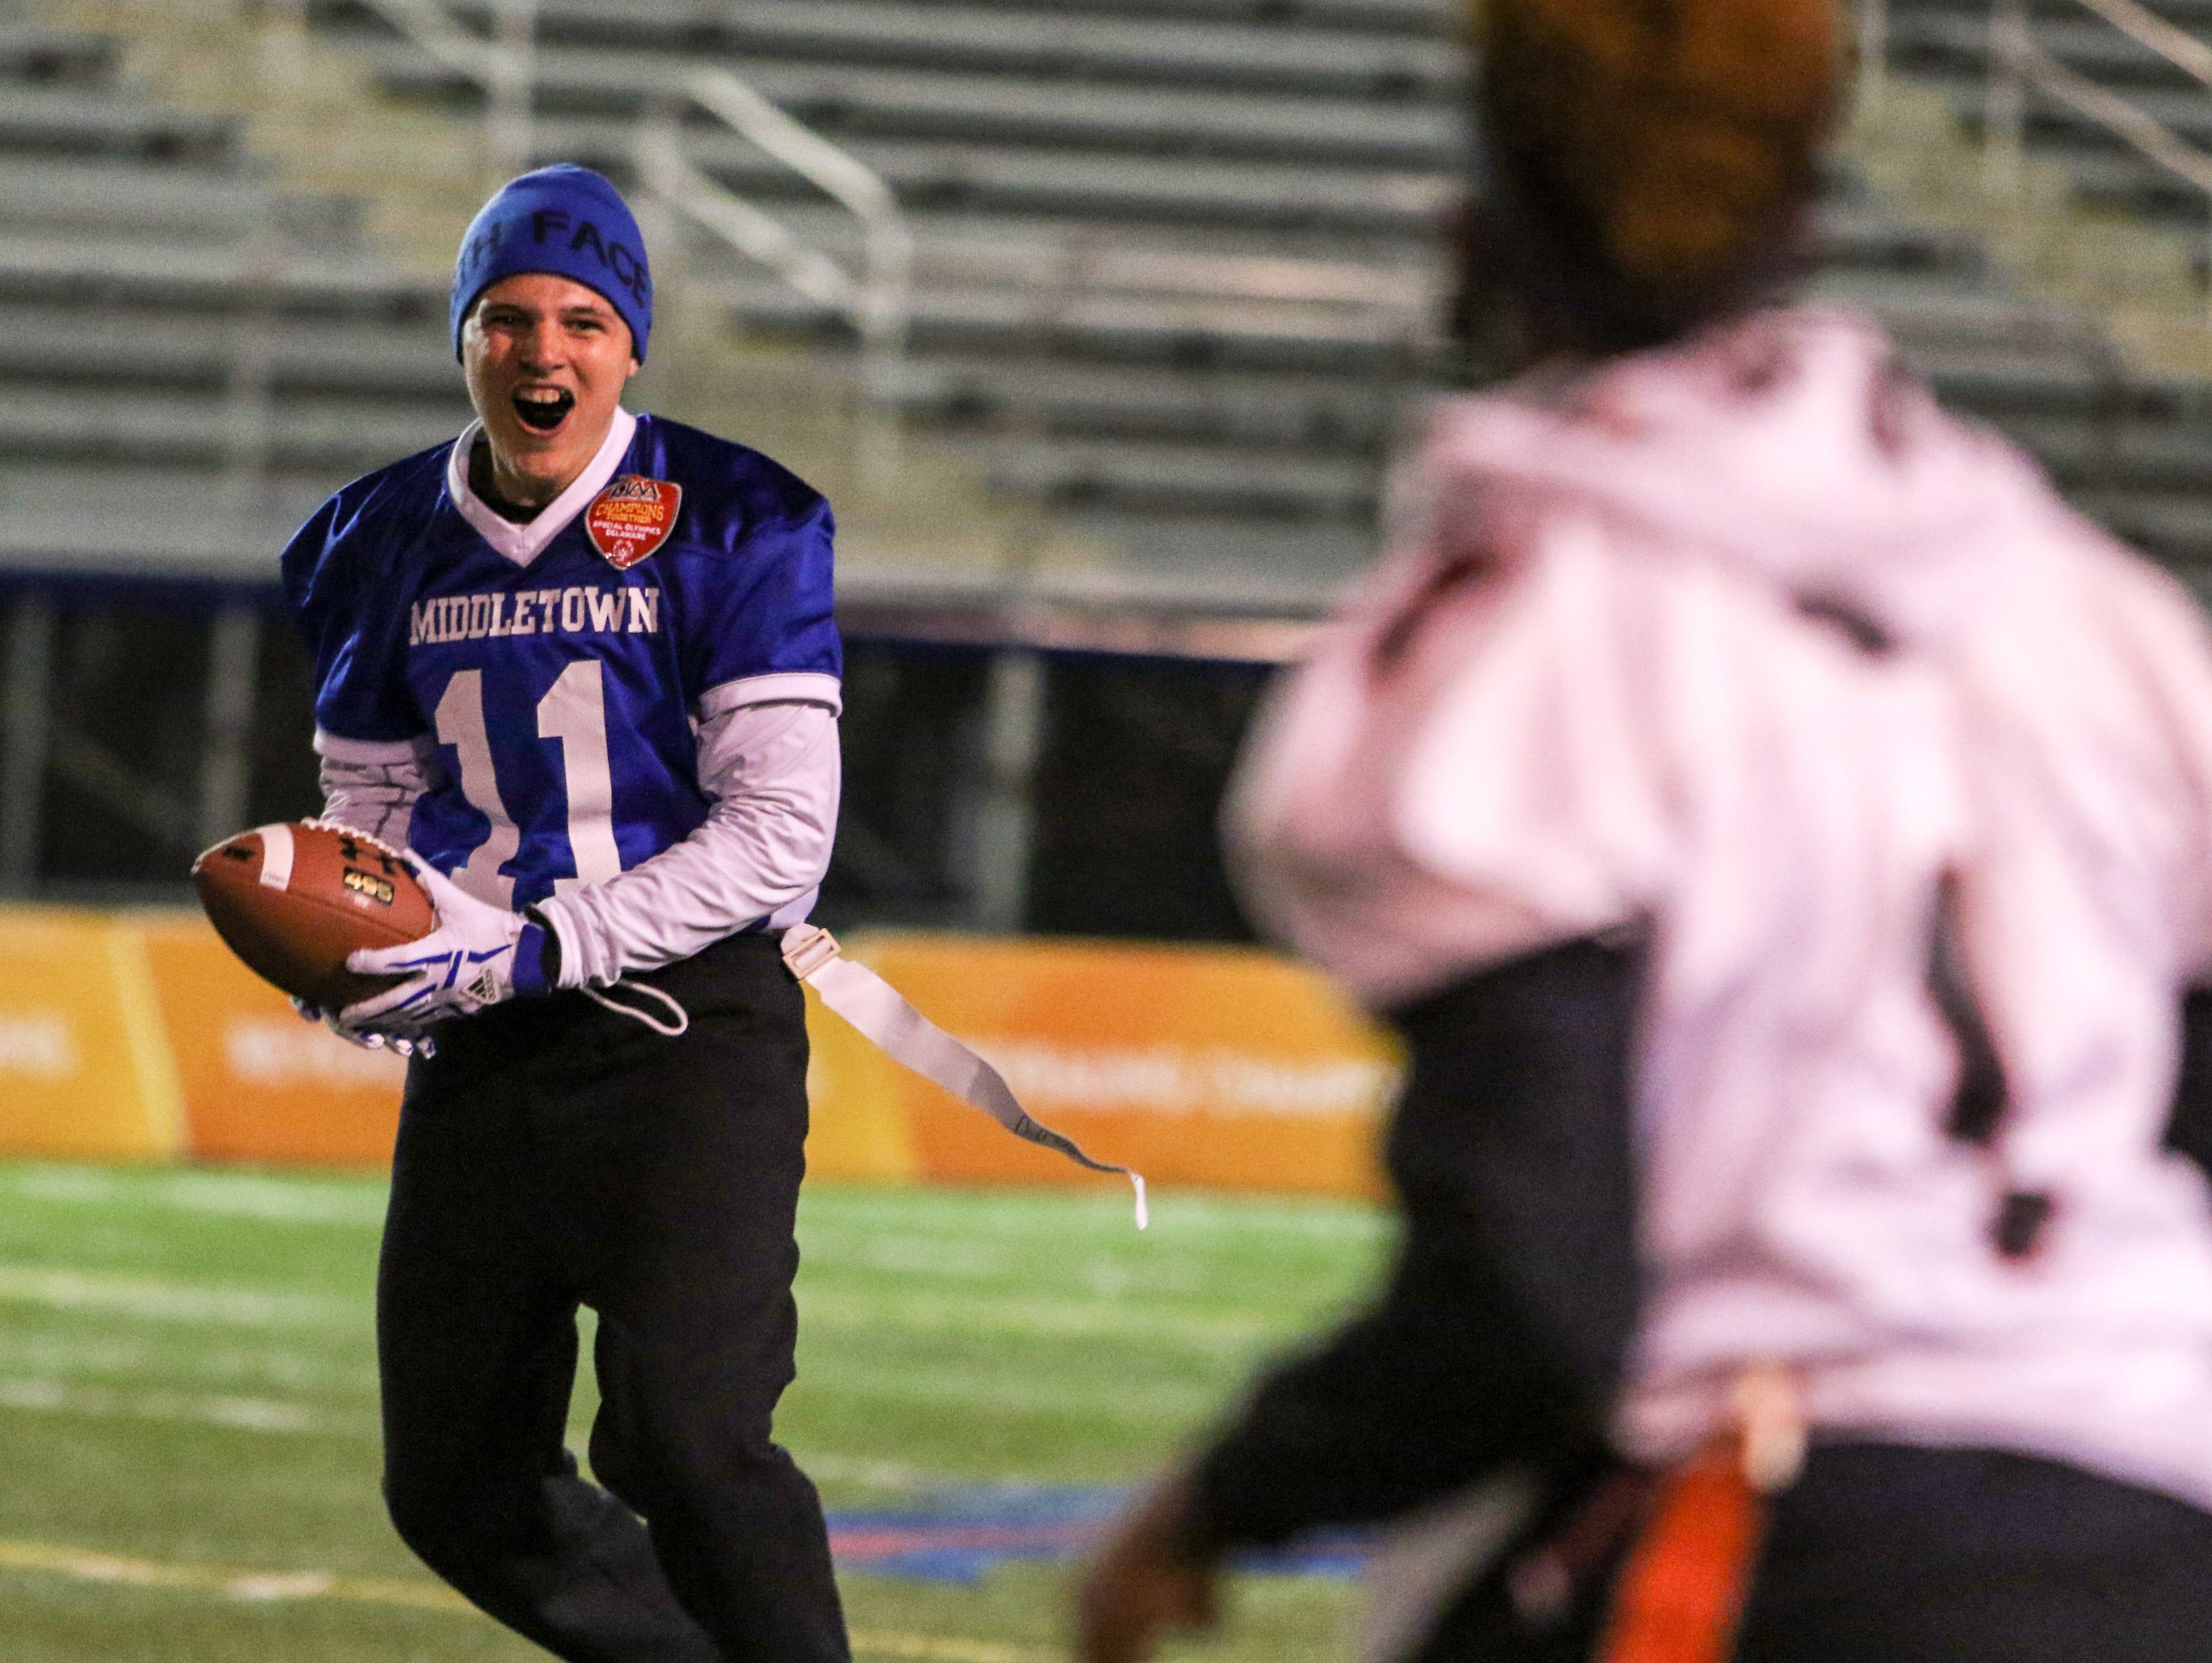 Middletown athlete Dalton Johnson celebrates a touchdown run.